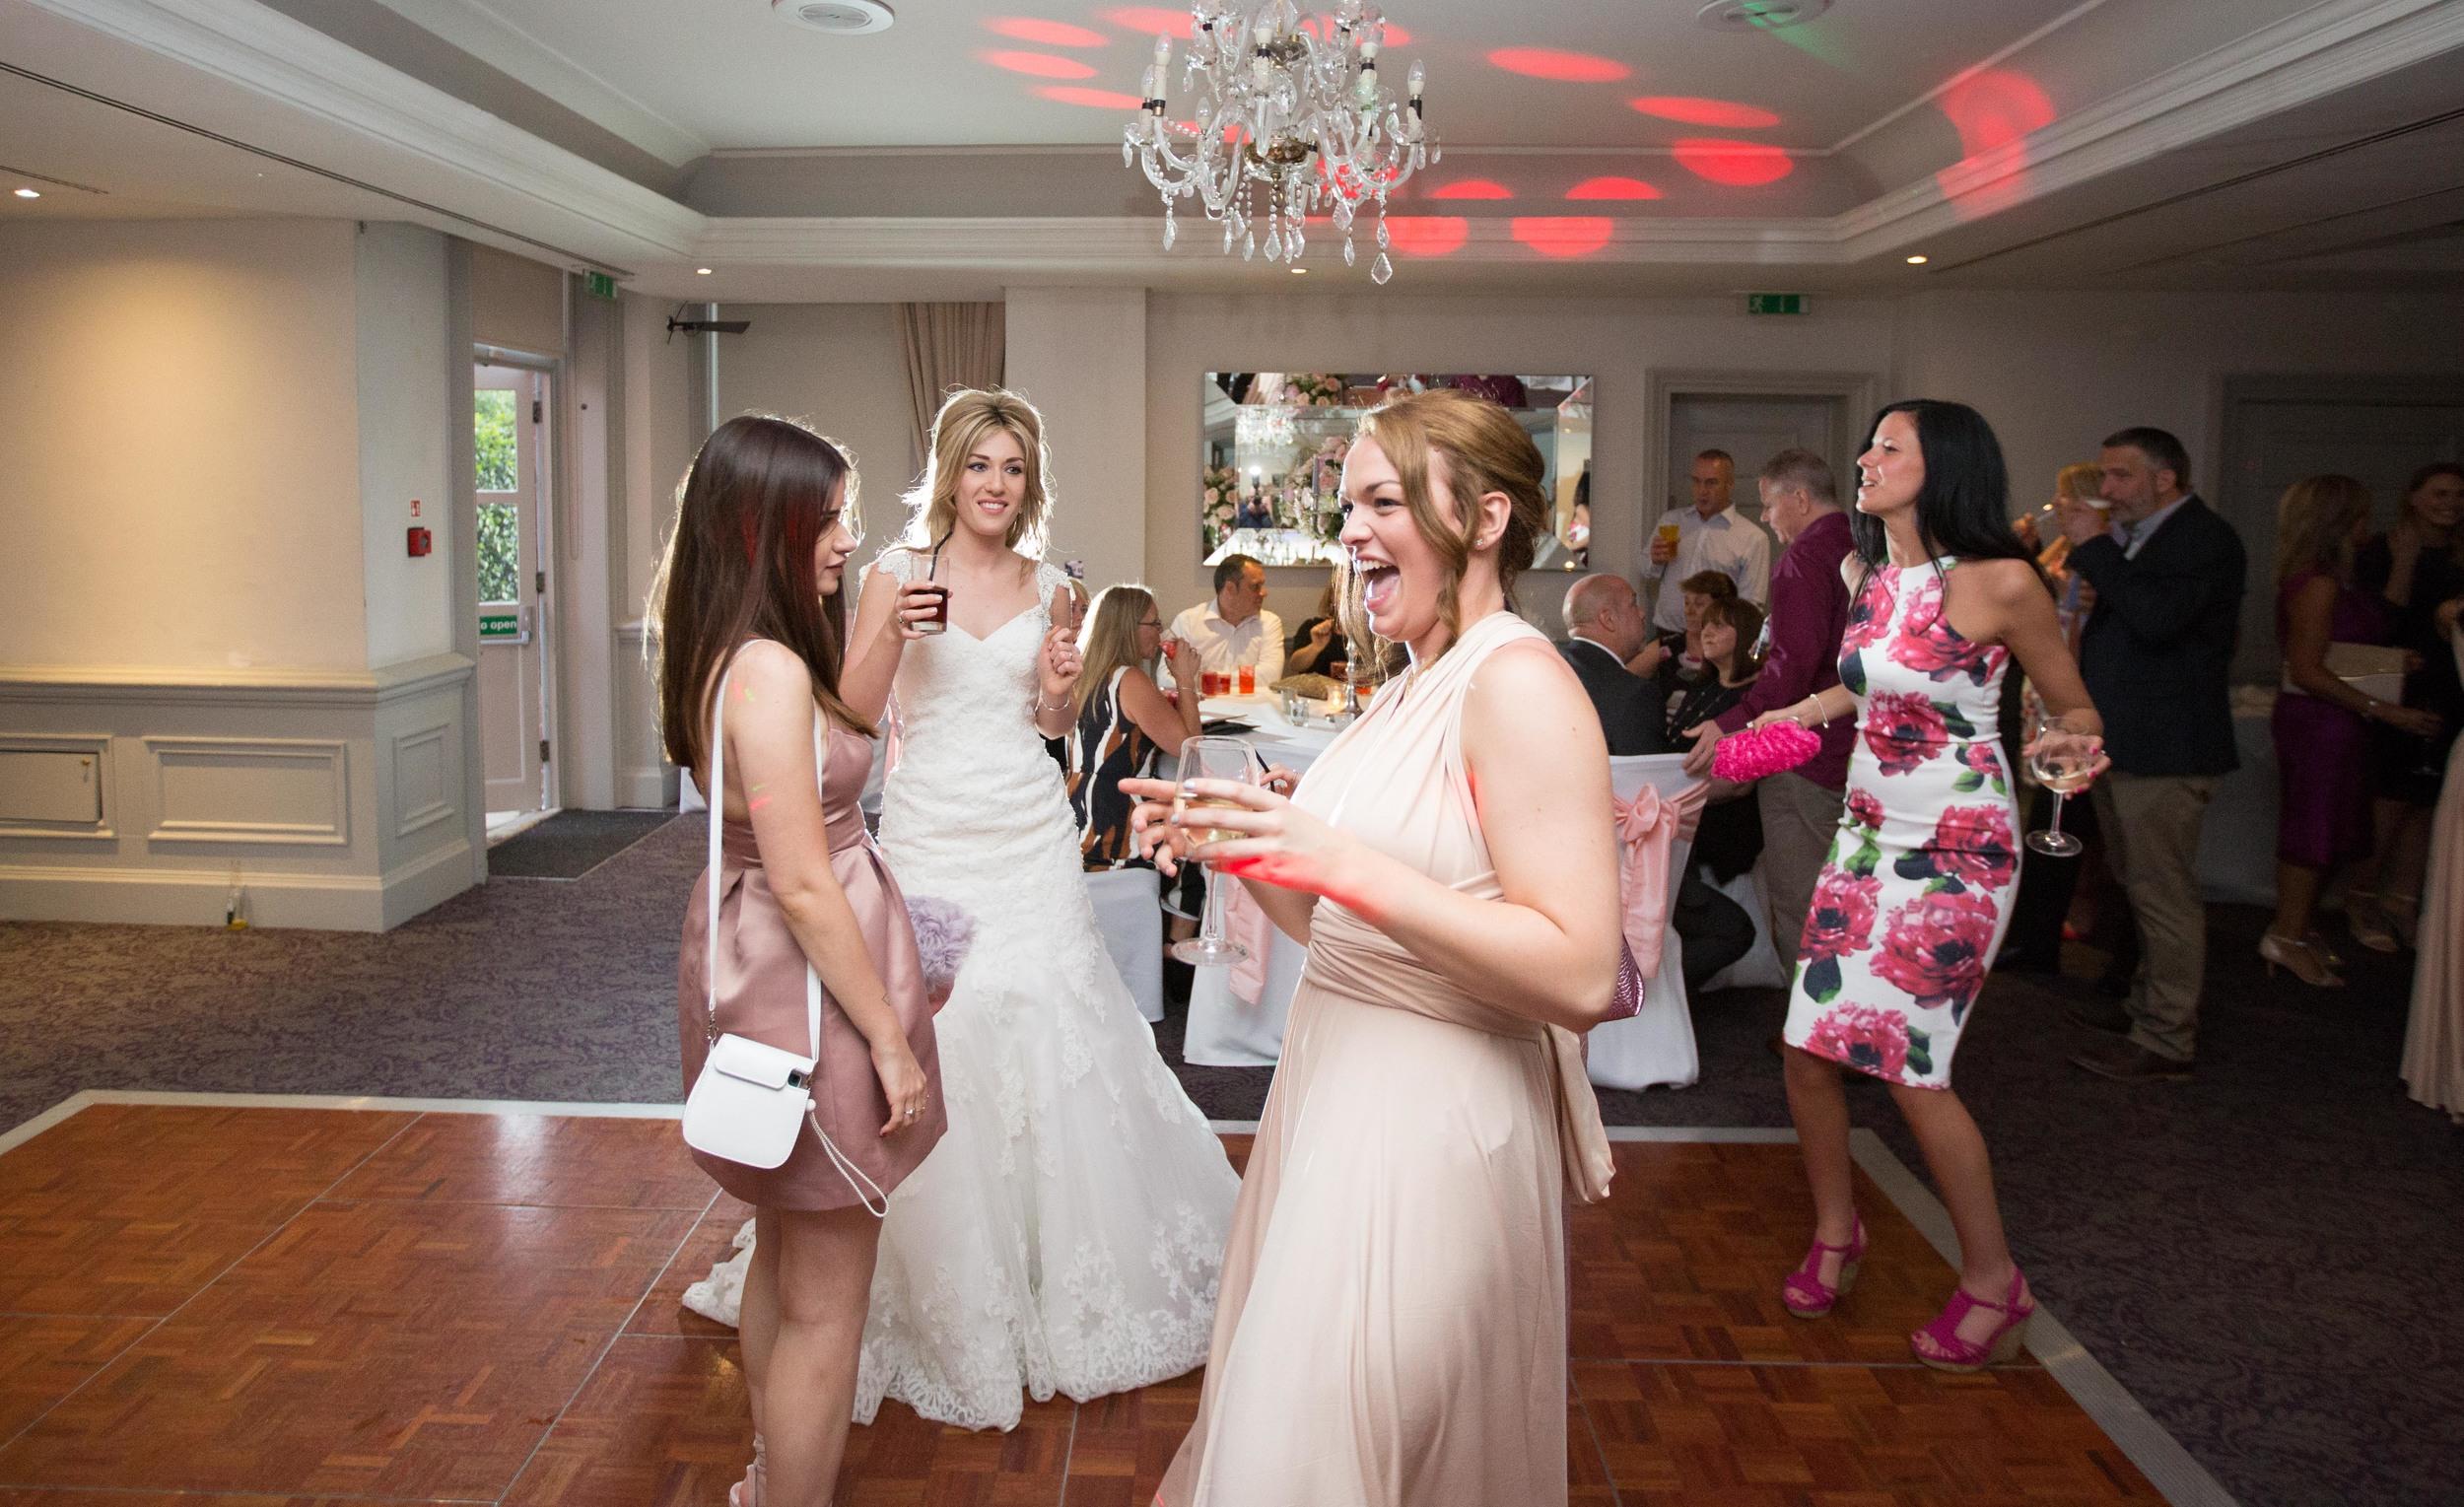 Woodlands-Park-Hotel-Cobham-Surrey-wedding-37